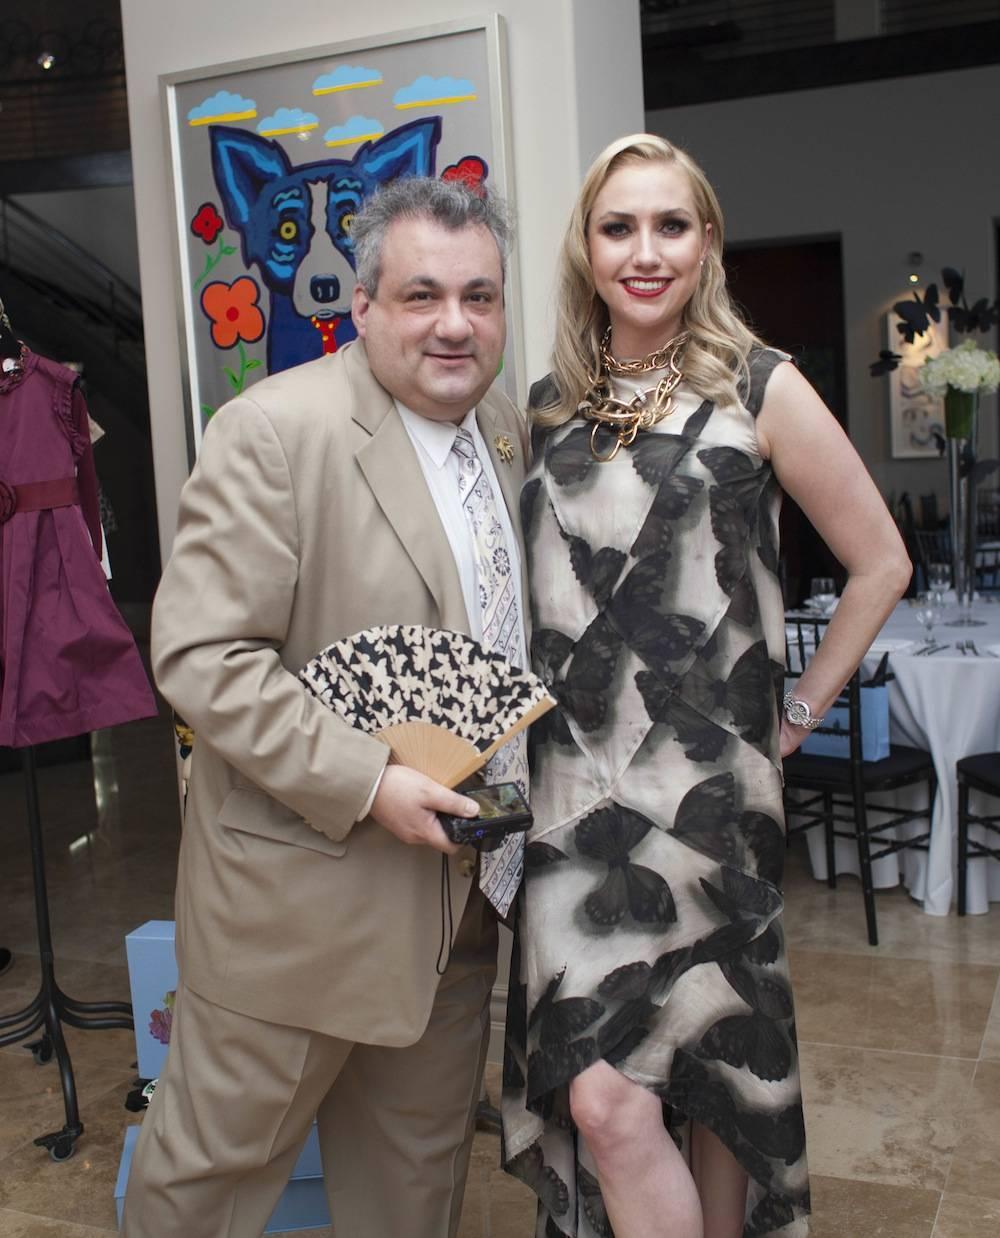 Audra Baldwin and Michael Shulman